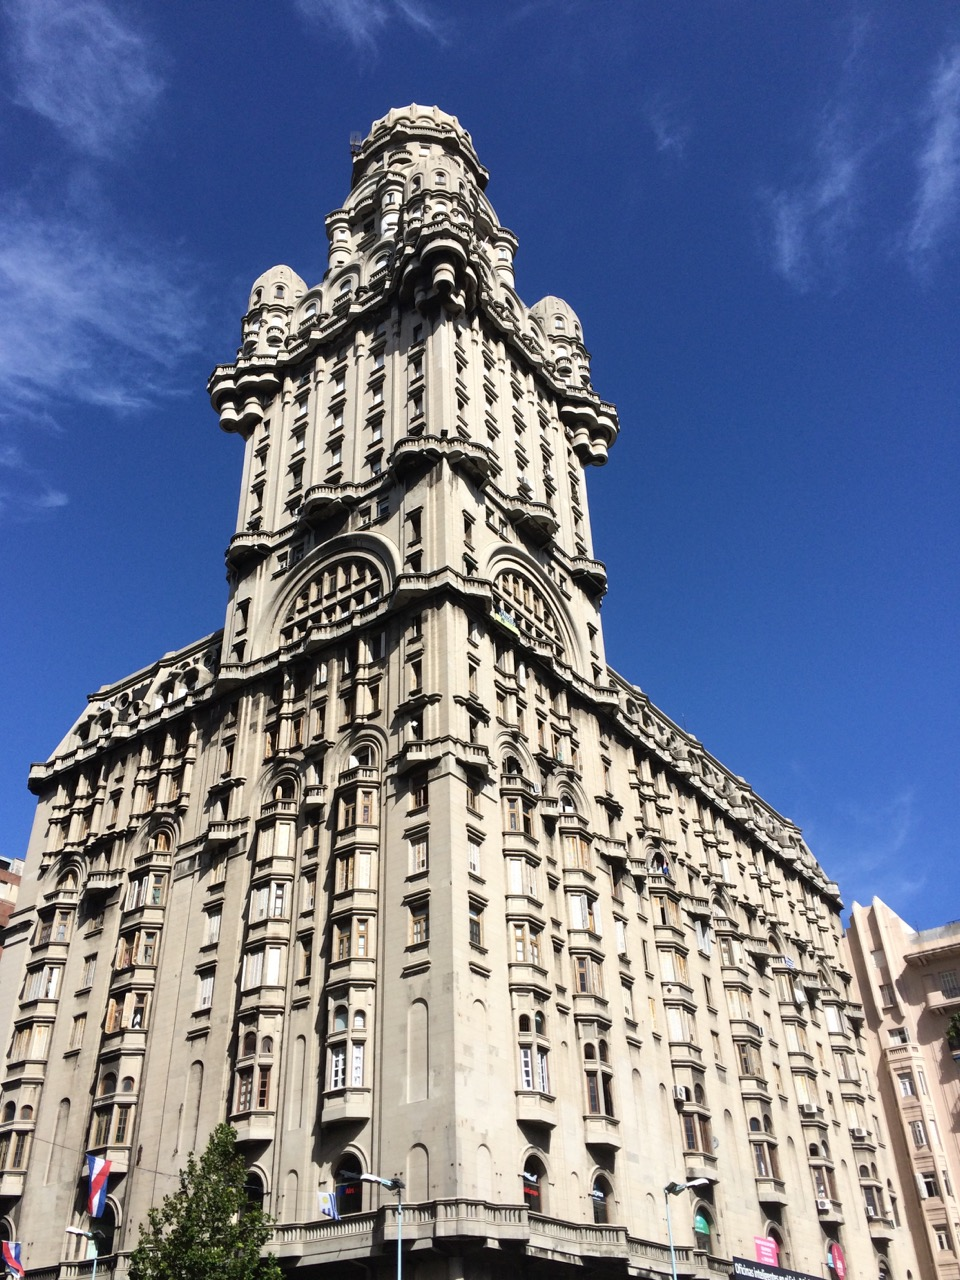 Palacio Salvo is the iconic landmark of Montevideo